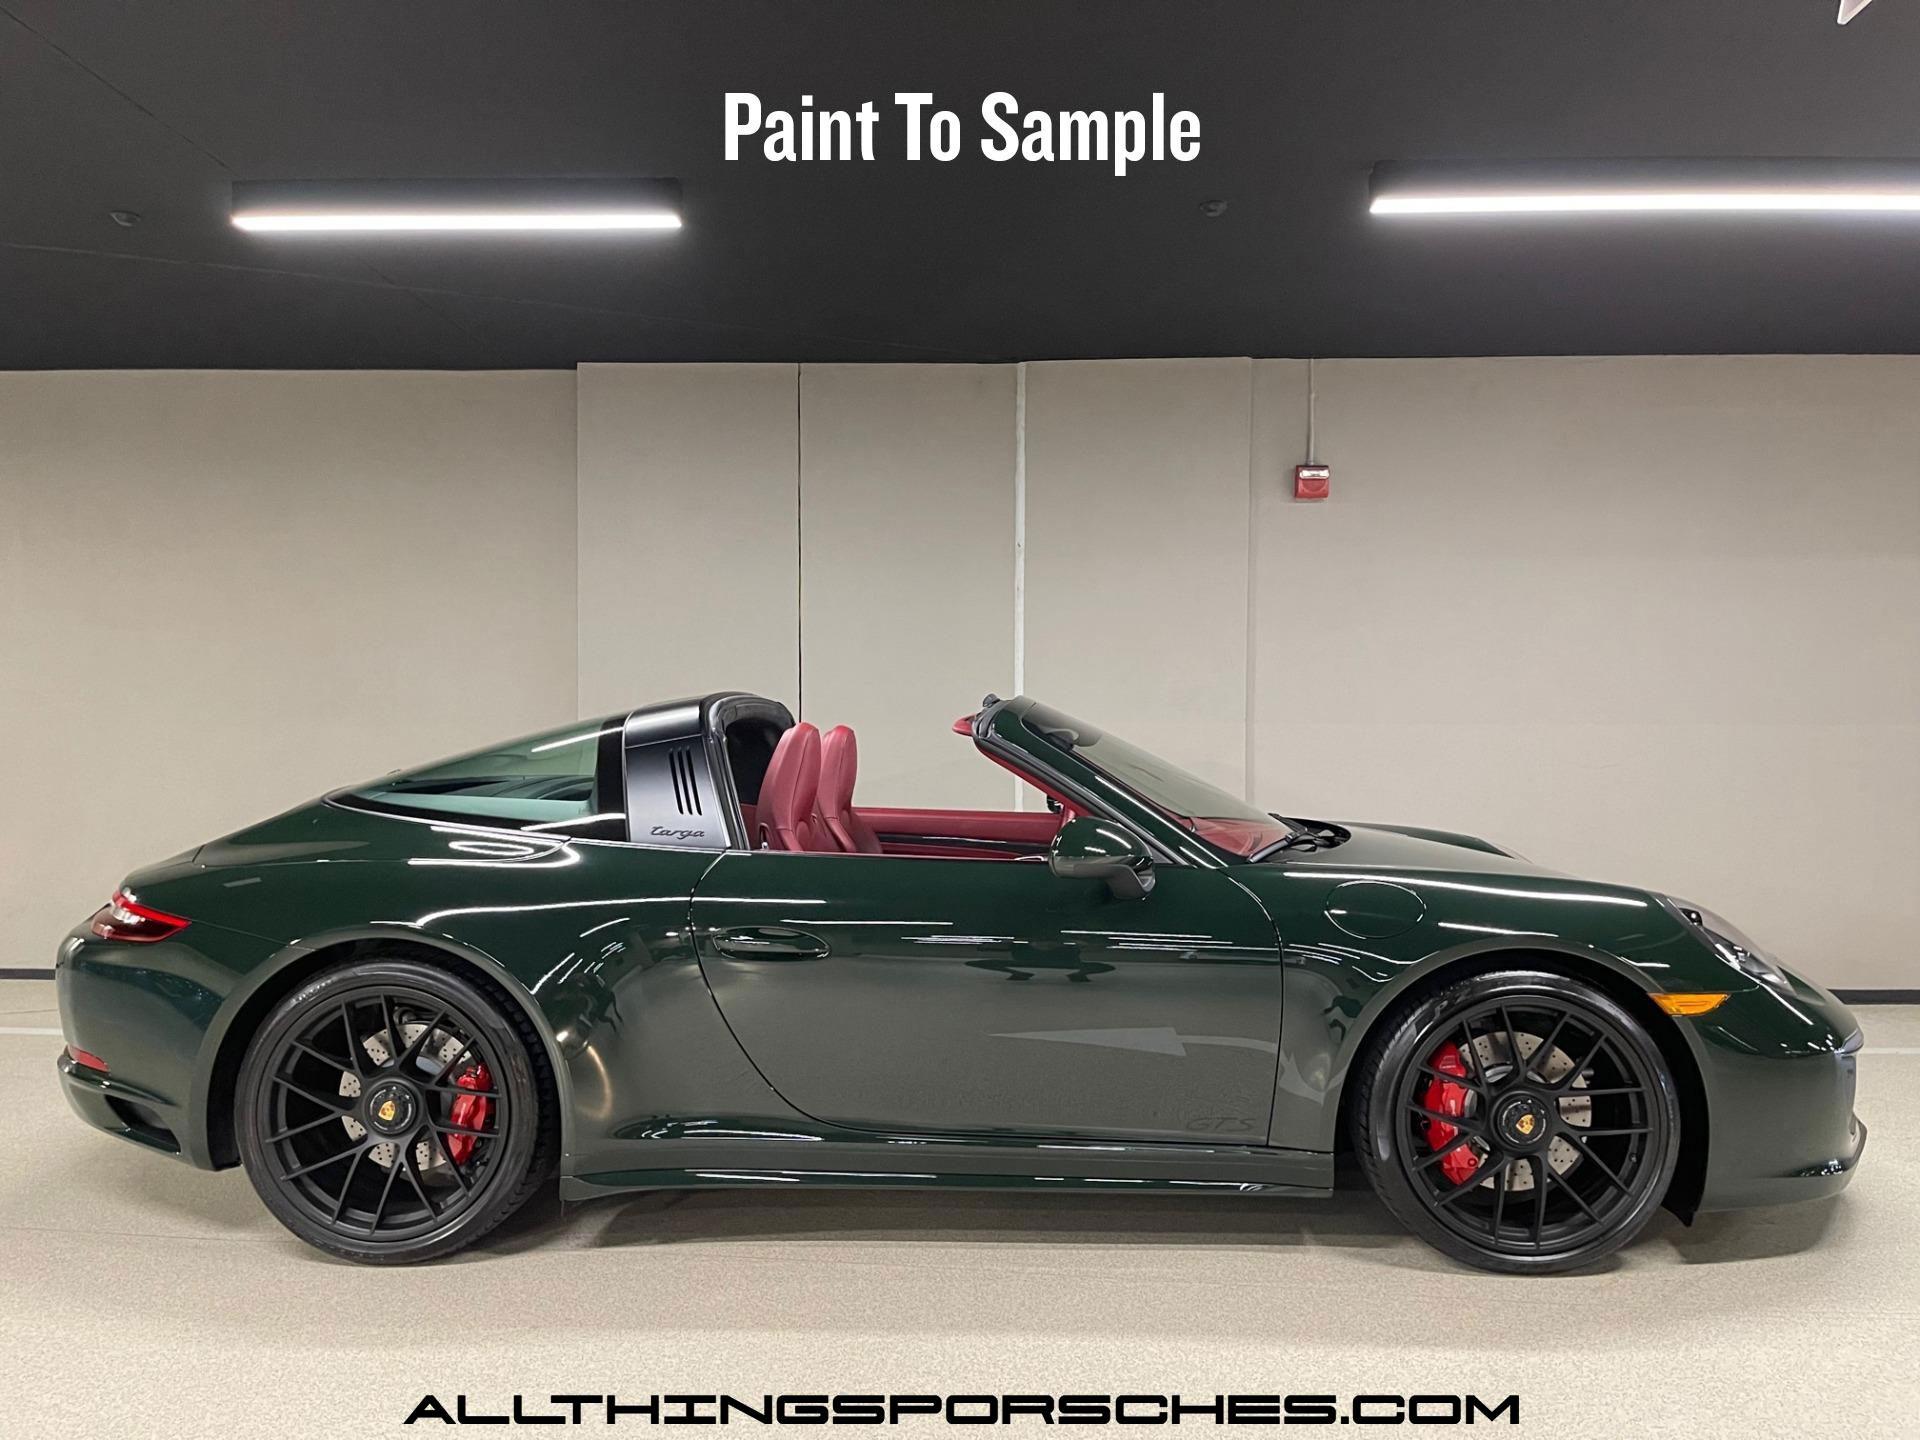 Used 2019 Porsche 911 Targa 4 GTS | North Miami Beach, FL